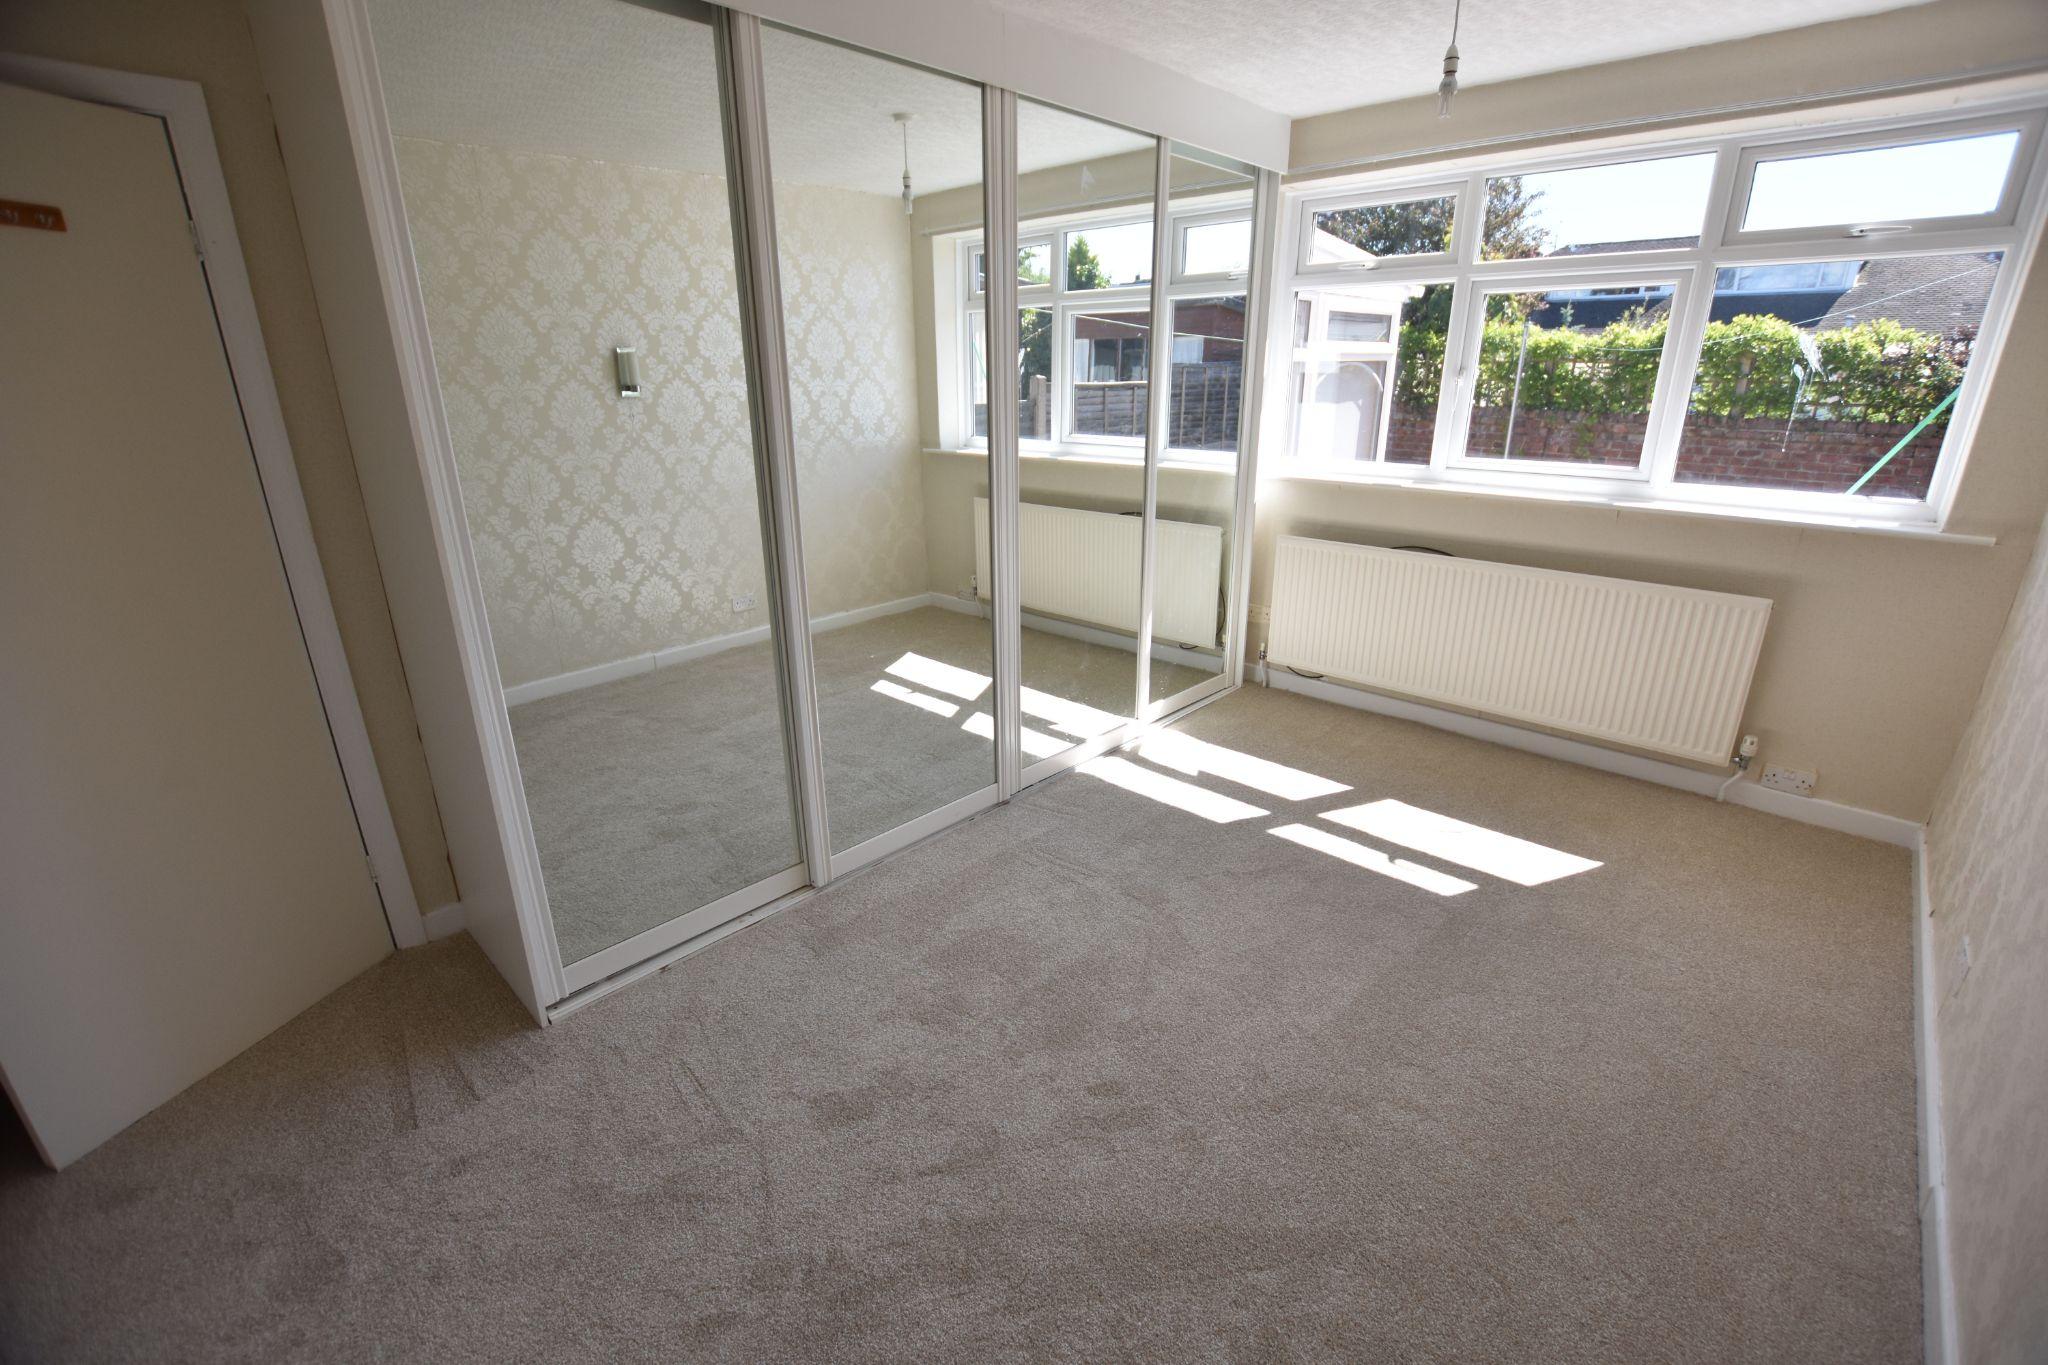 2 bedroom detached bungalow For Sale in Lytham St Annes - Bedroom 2